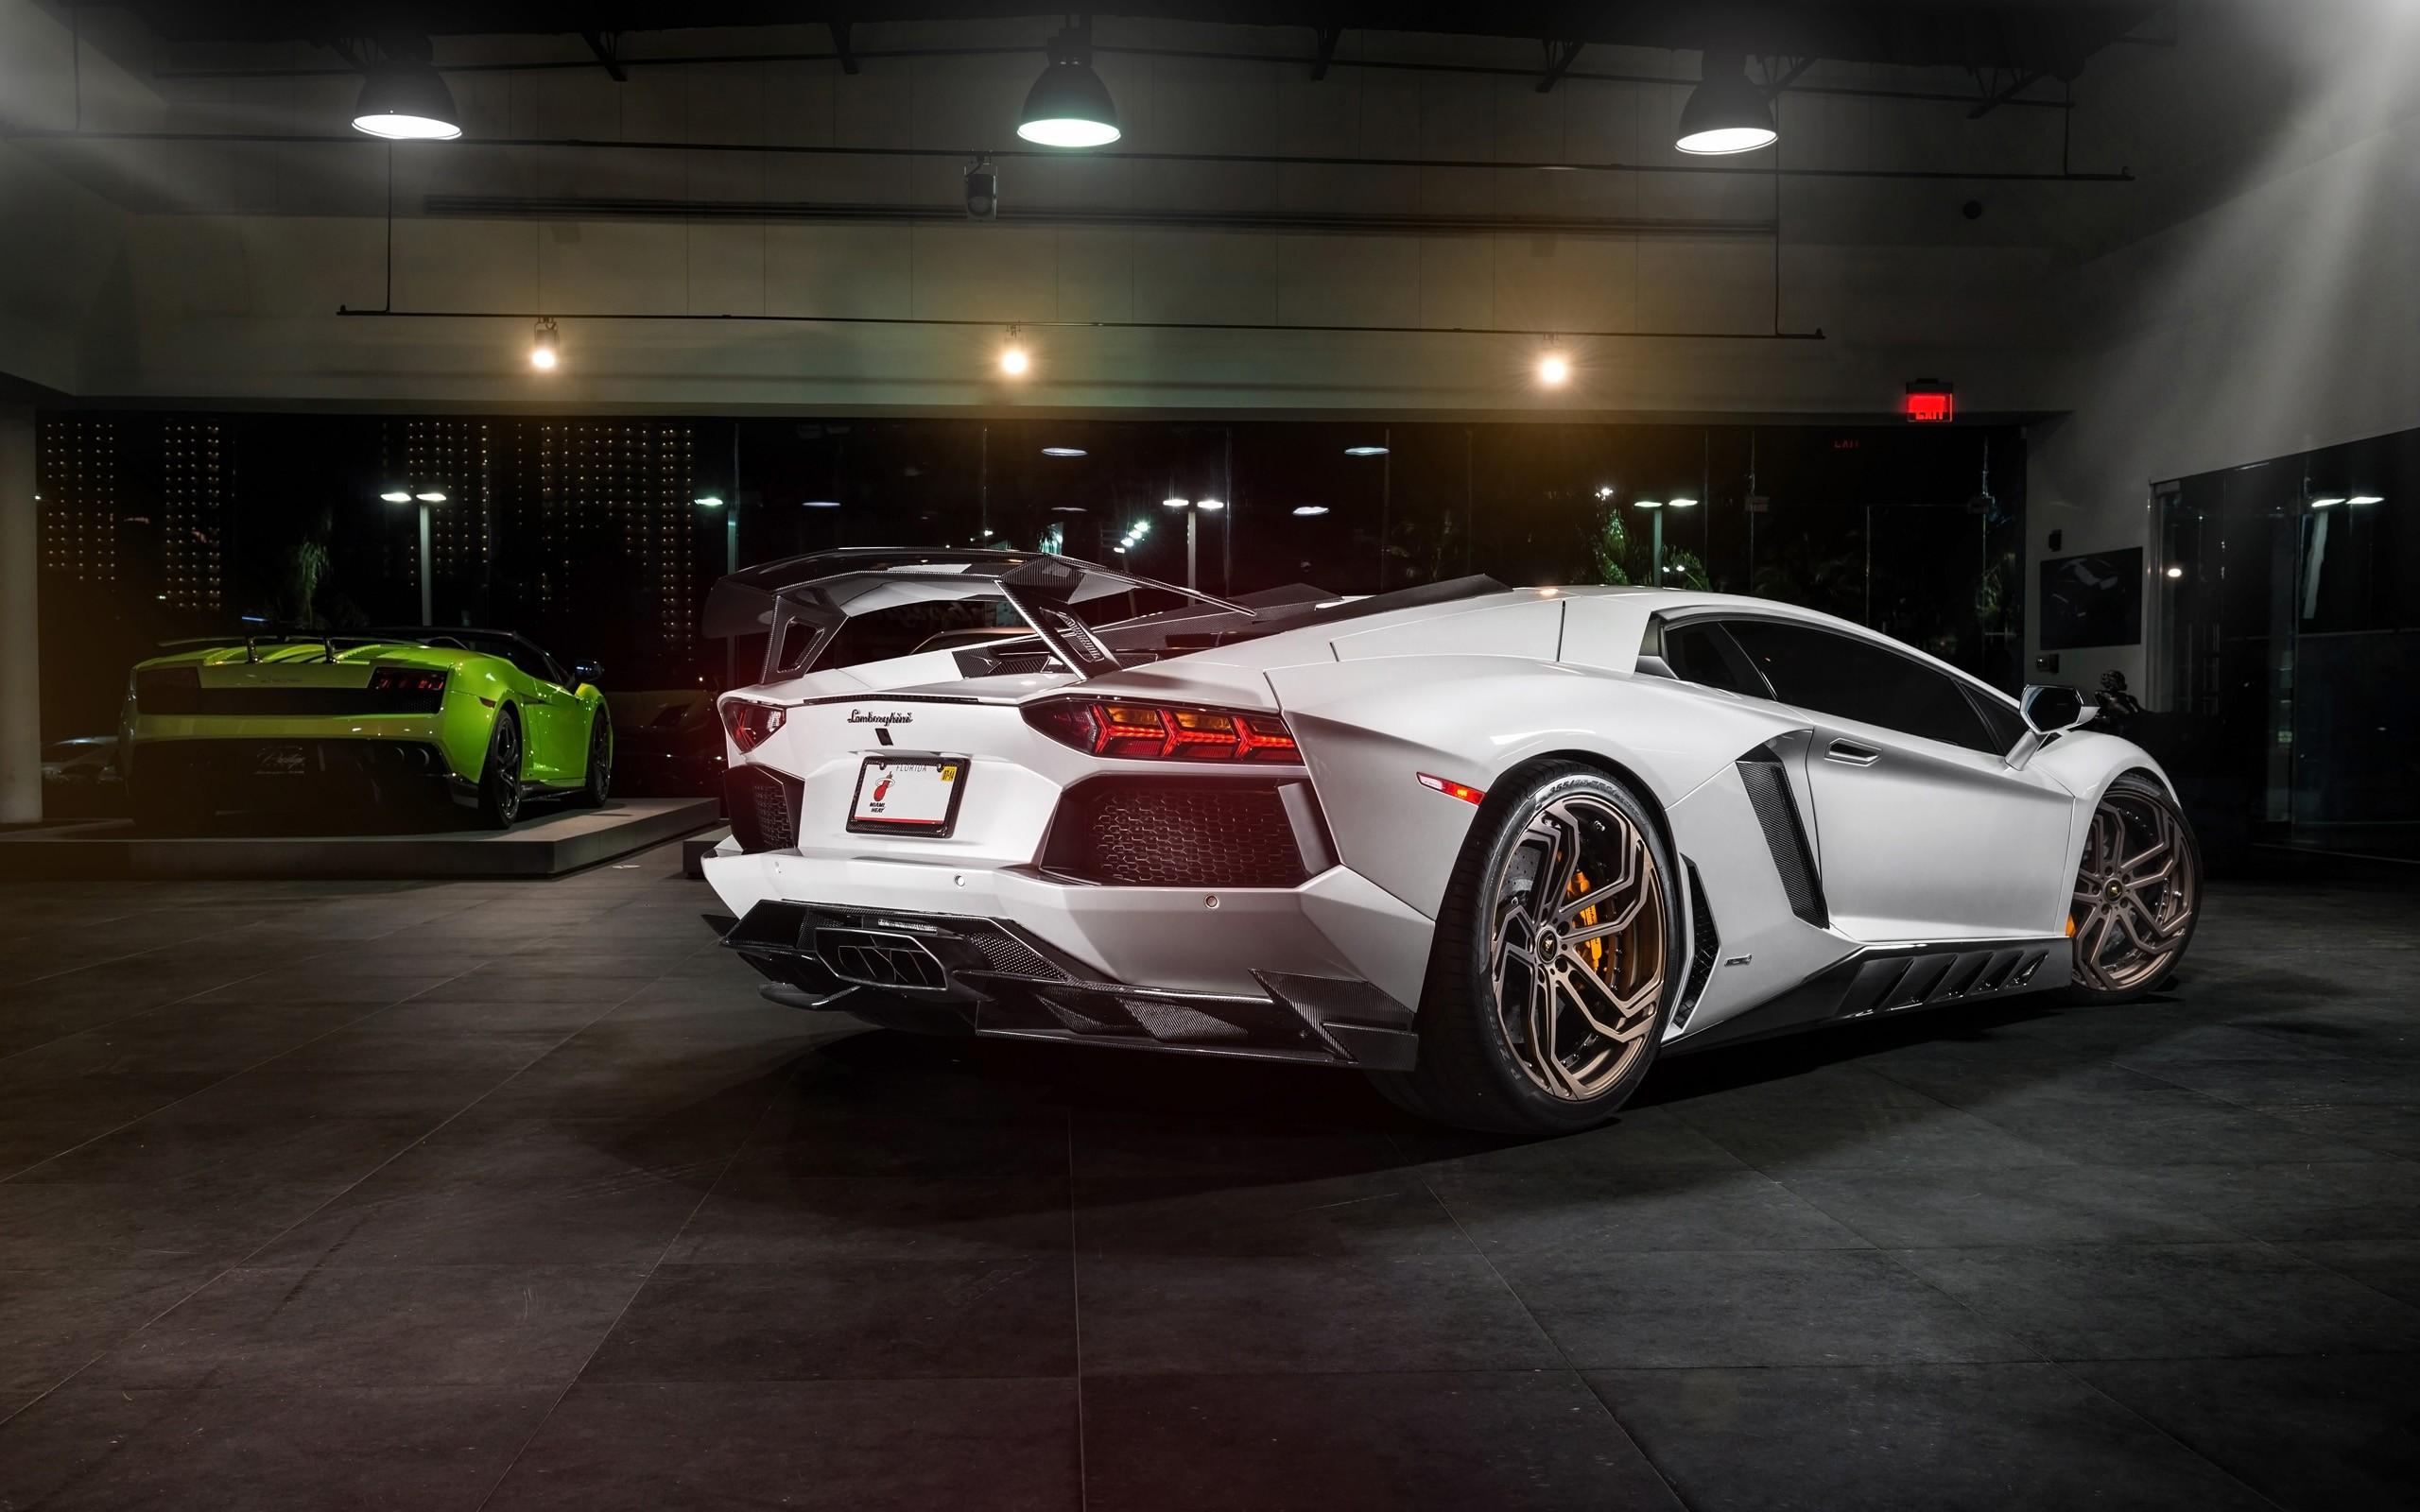 2014 Lamborghini Aventador NL2 By Novitec Torado 2